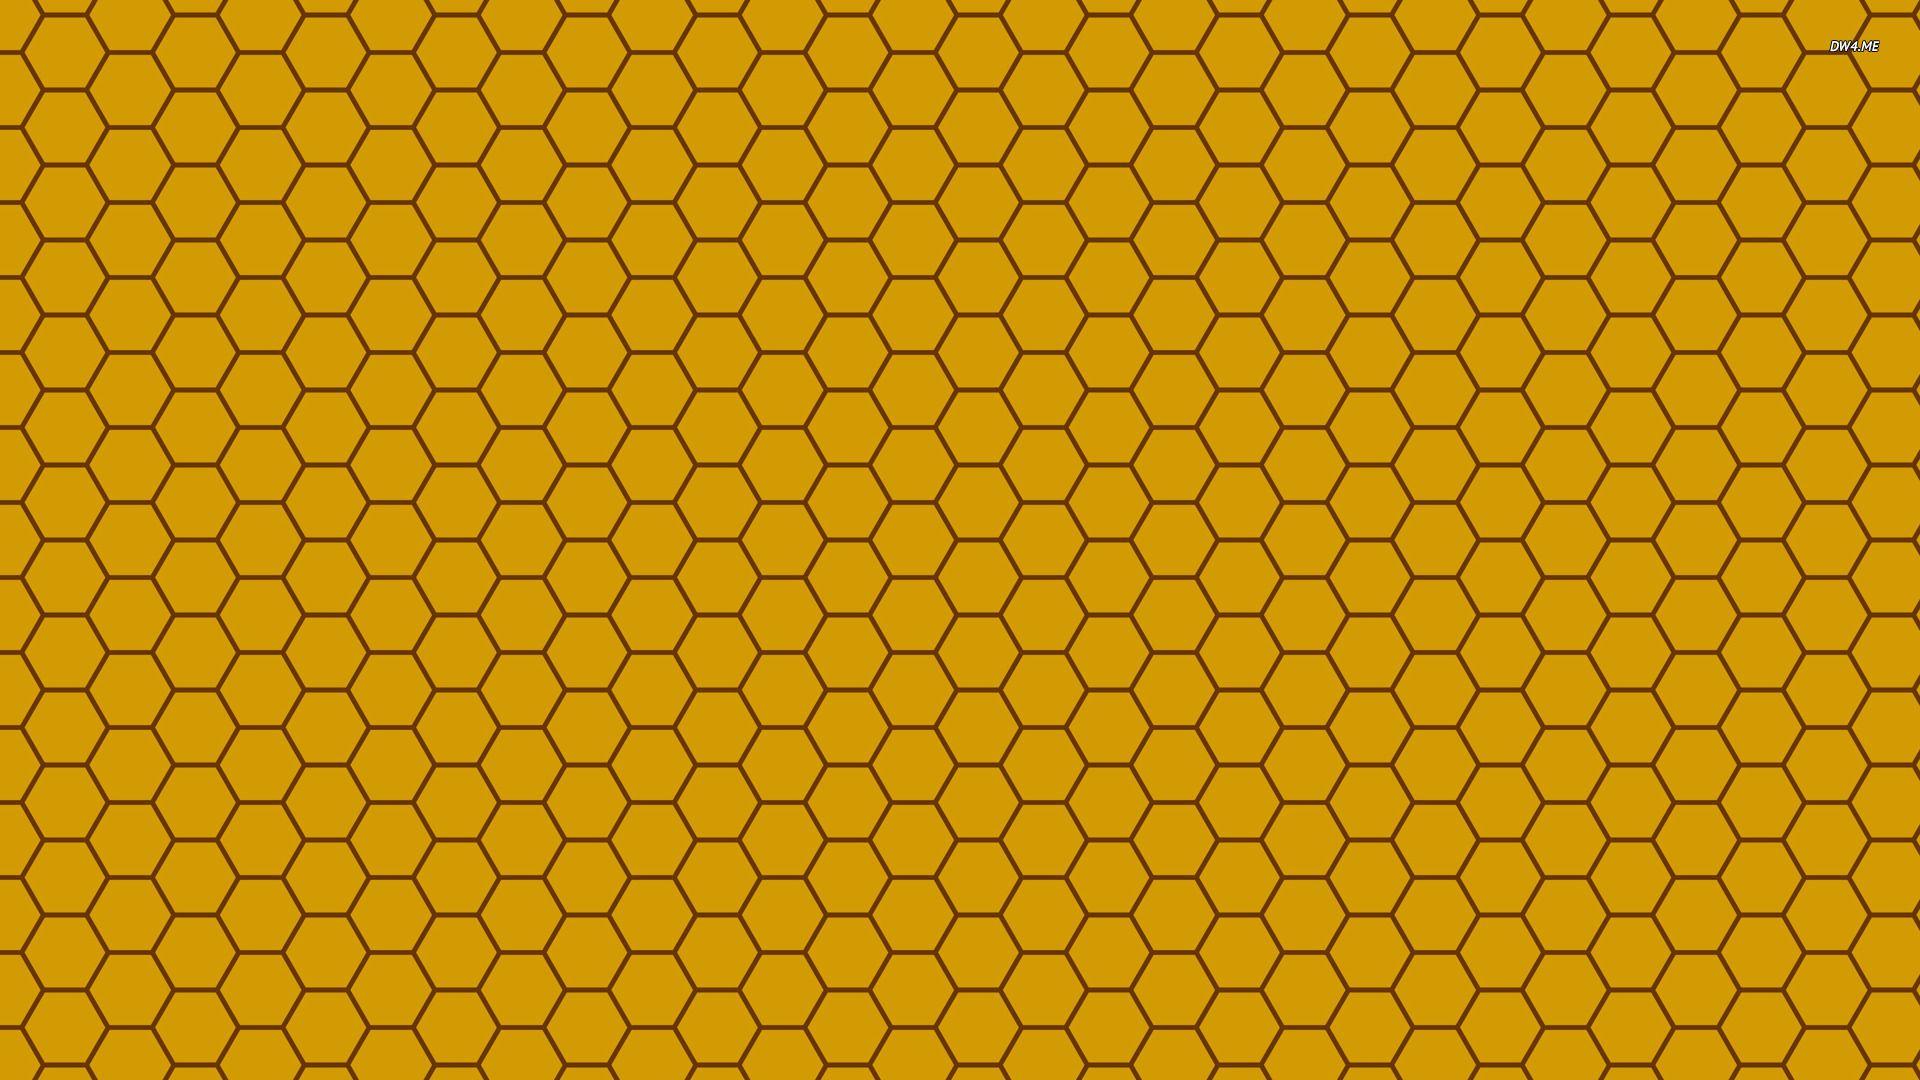 Honeycomb Wallpaper Honeycomb Wallpaper Wallpaper Hexagonal Tessellation